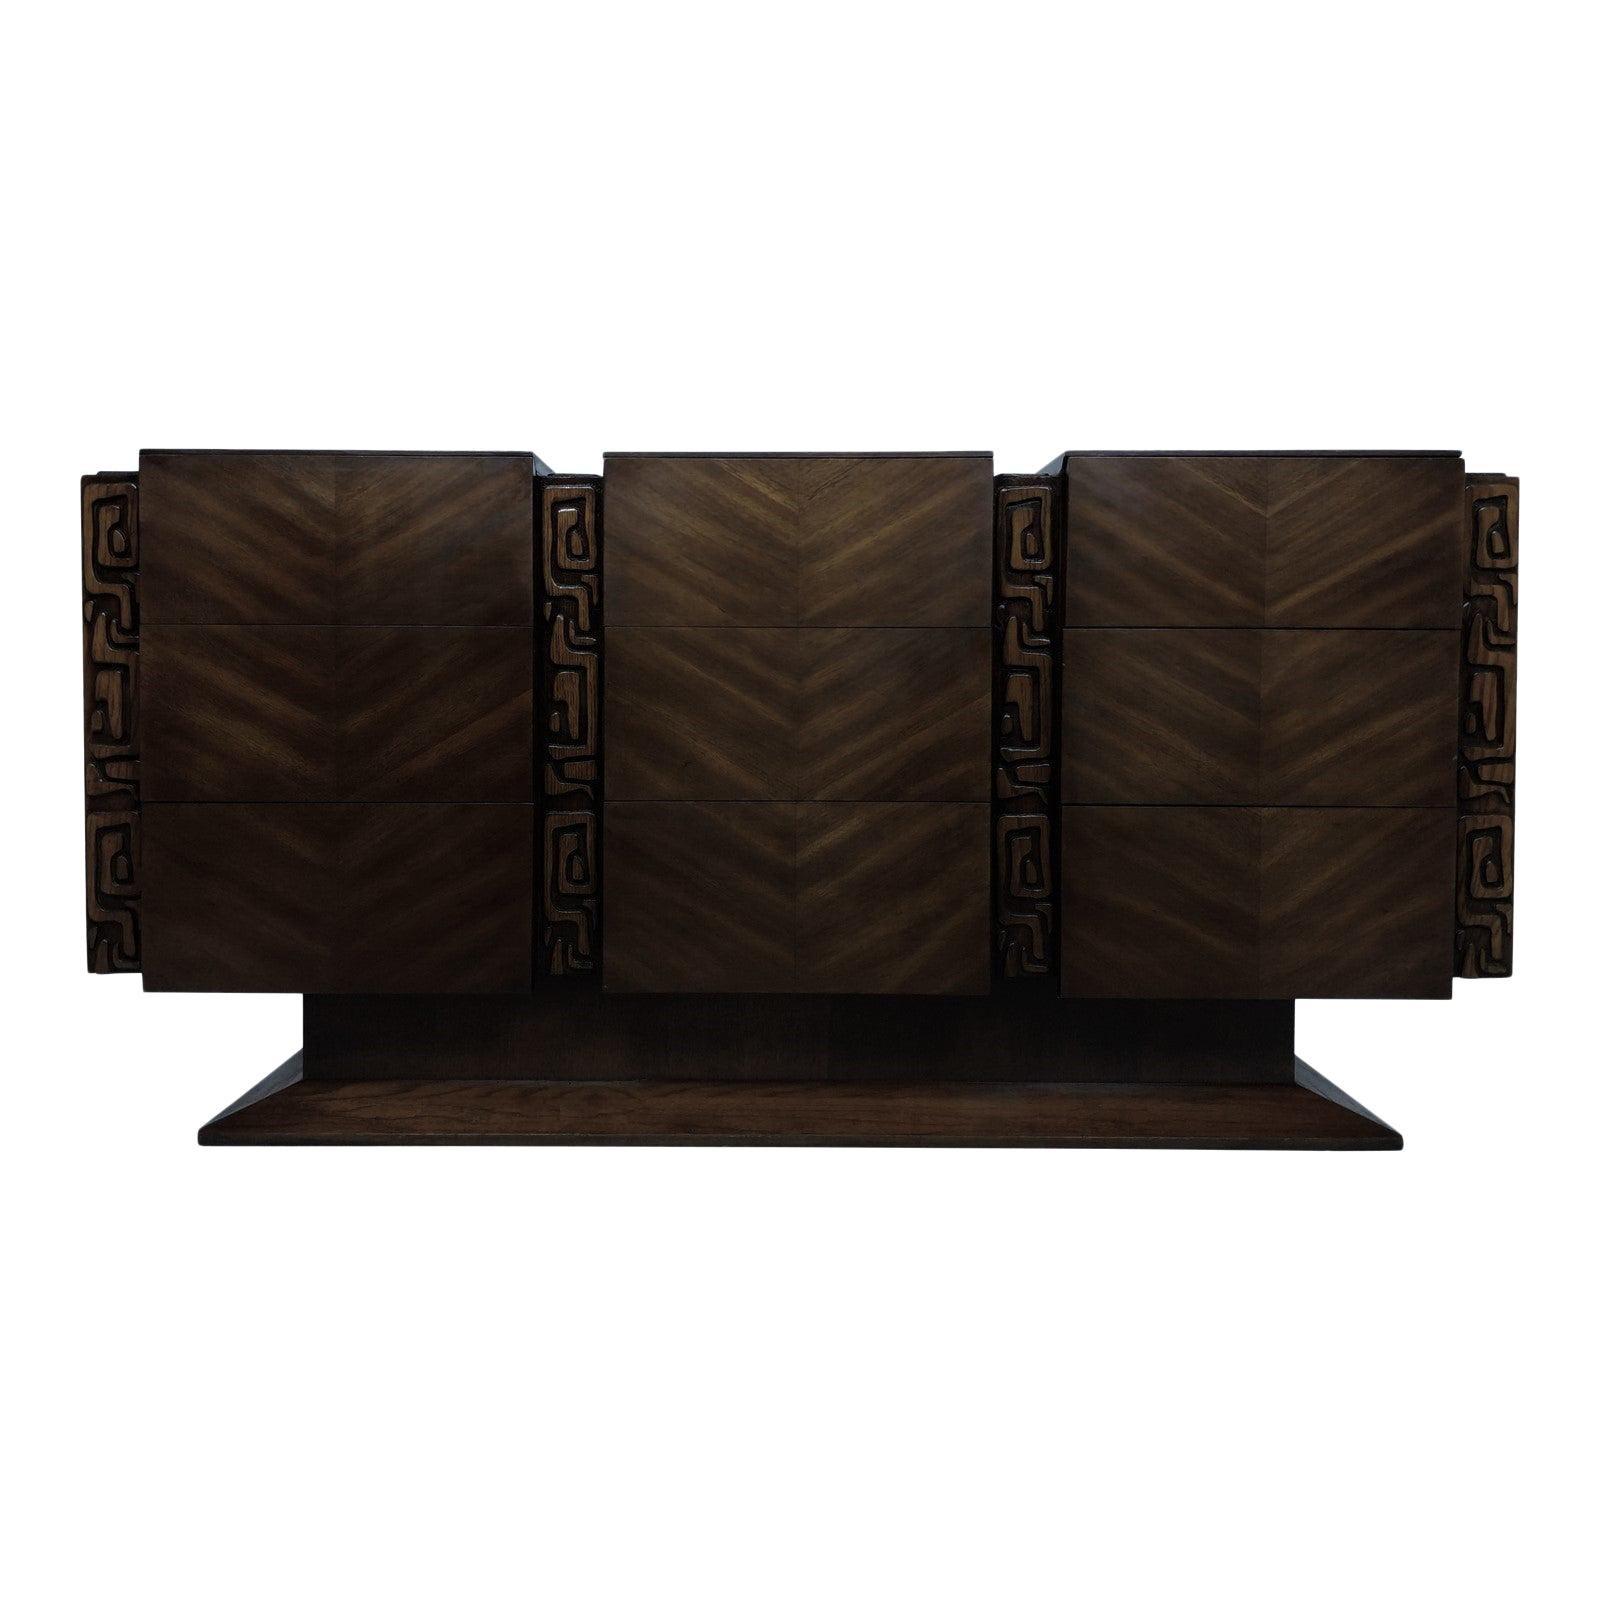 Brutalist Midcentury Tiki Inspired Dresser by United Furniture Co.